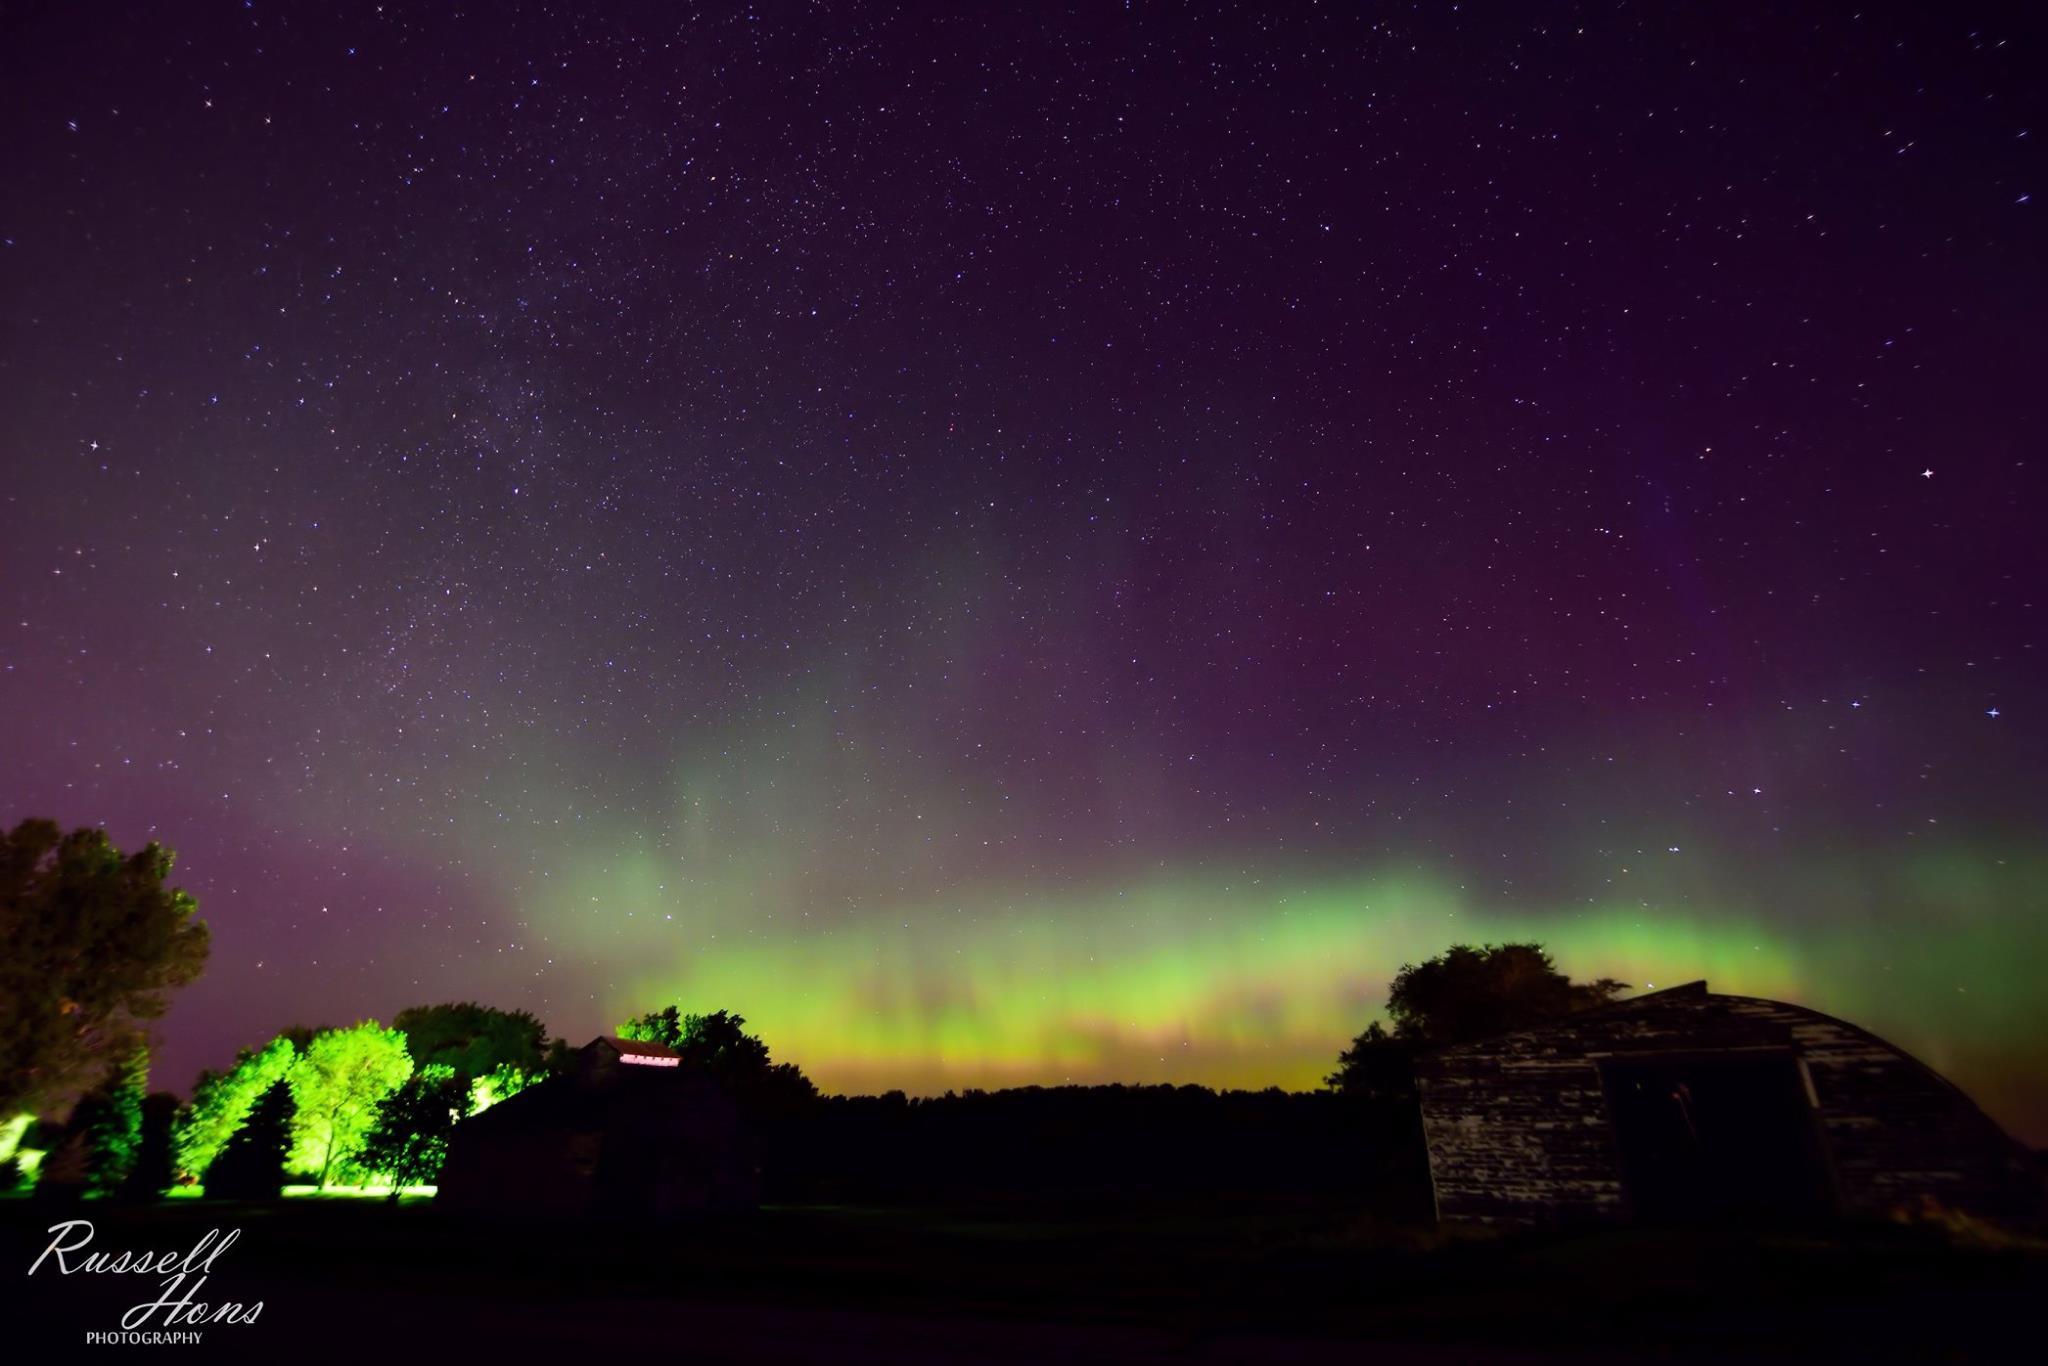 russ hons photo gallery aurora borealis september 11 2015